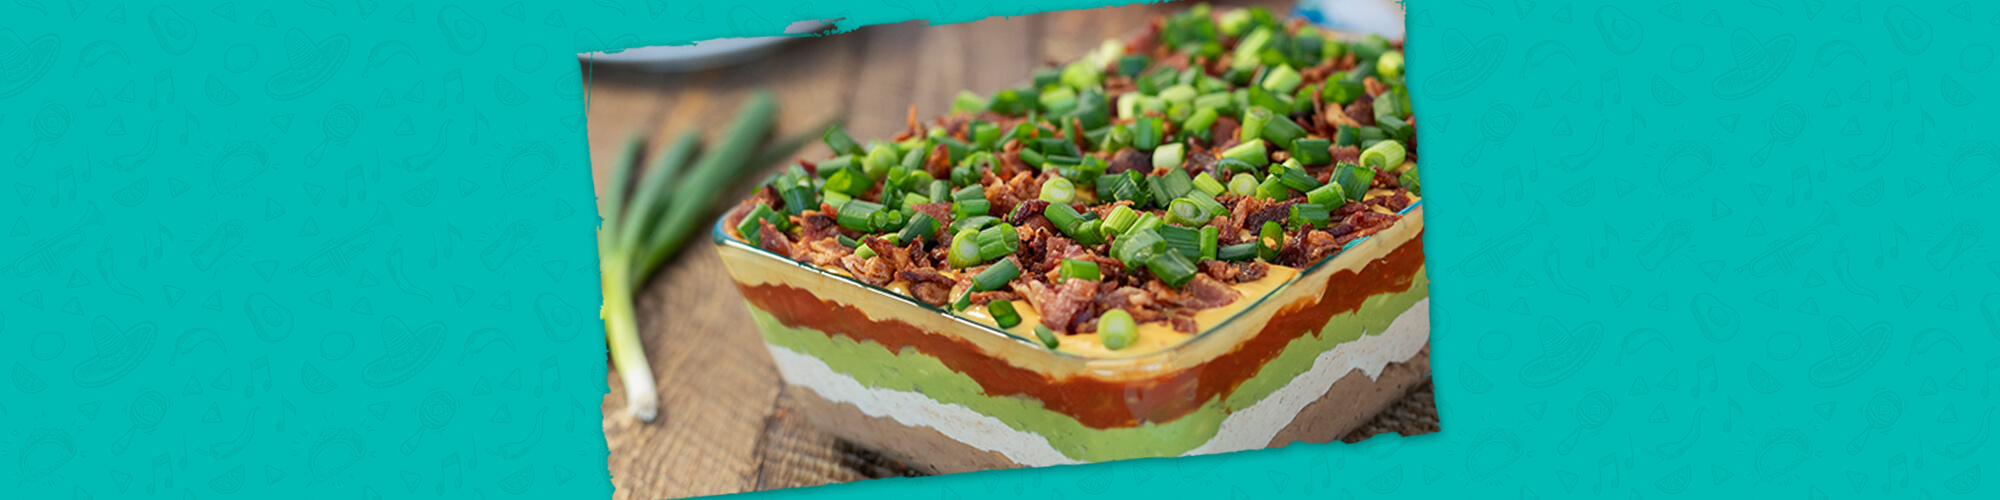 Salsas 7 layer dip with bacon